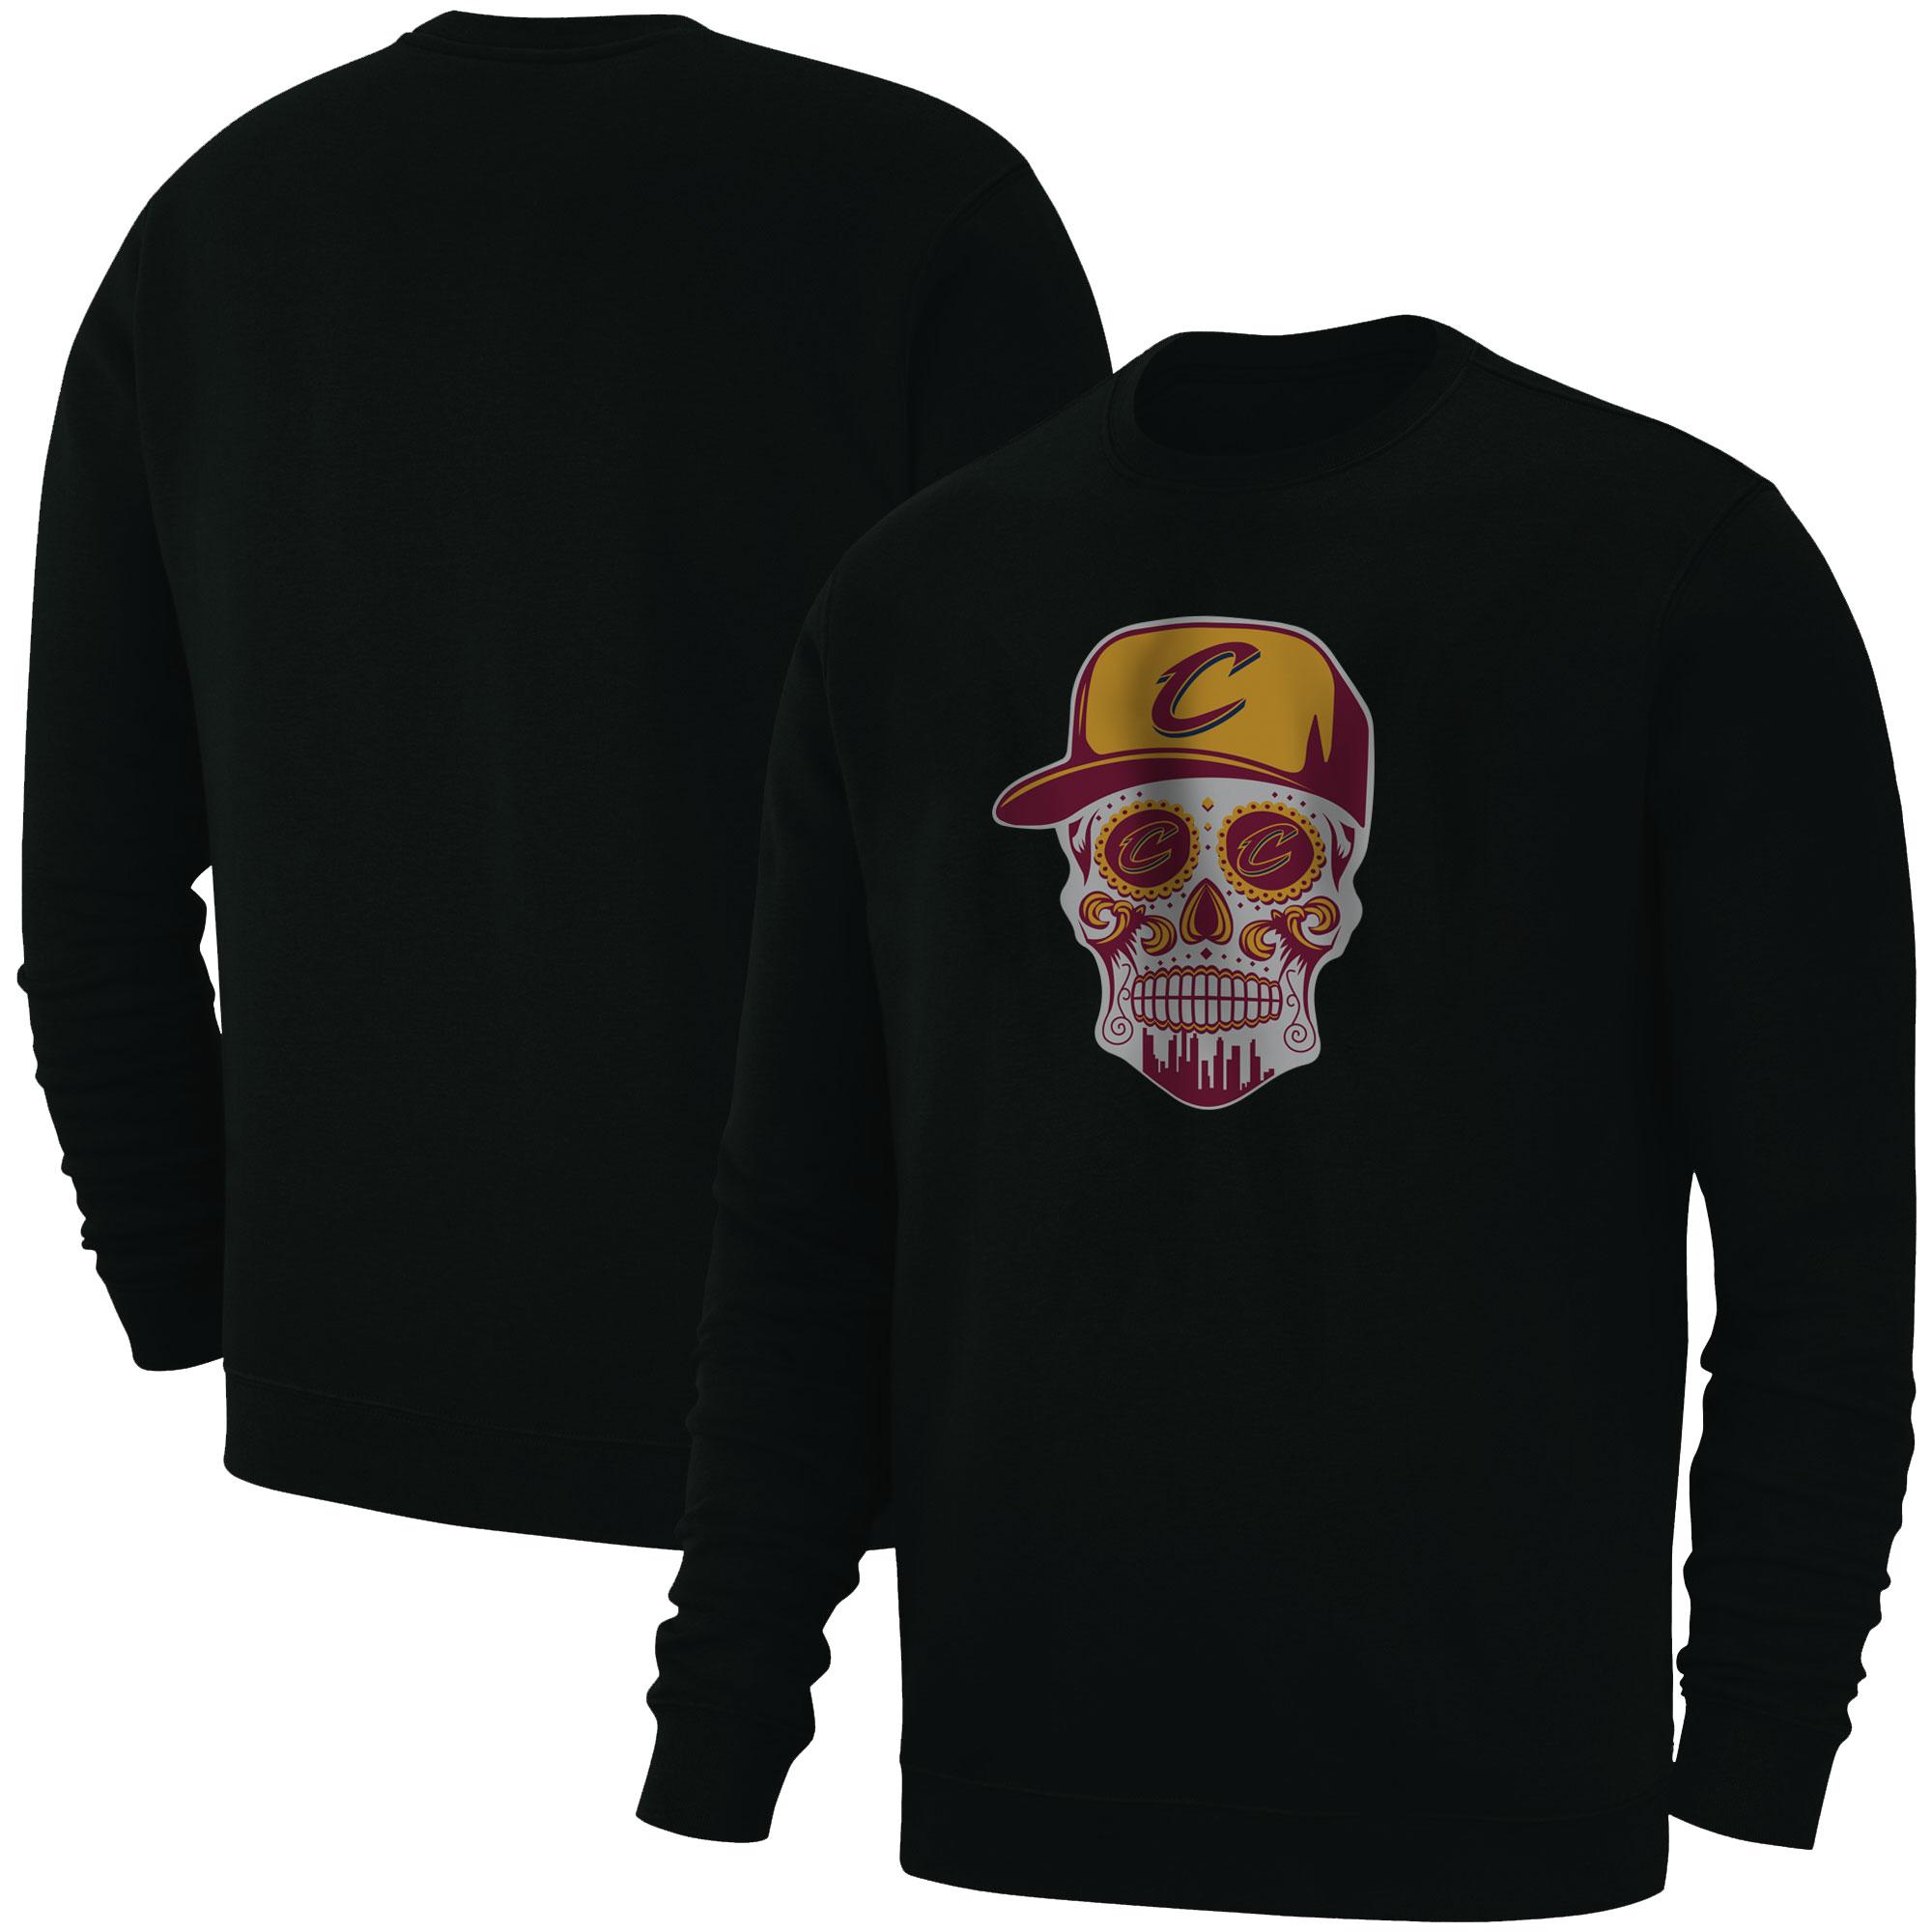 Cleveland  Skull Basic (BSC-BLC-NP-449-NBA-CLE-SKULL)